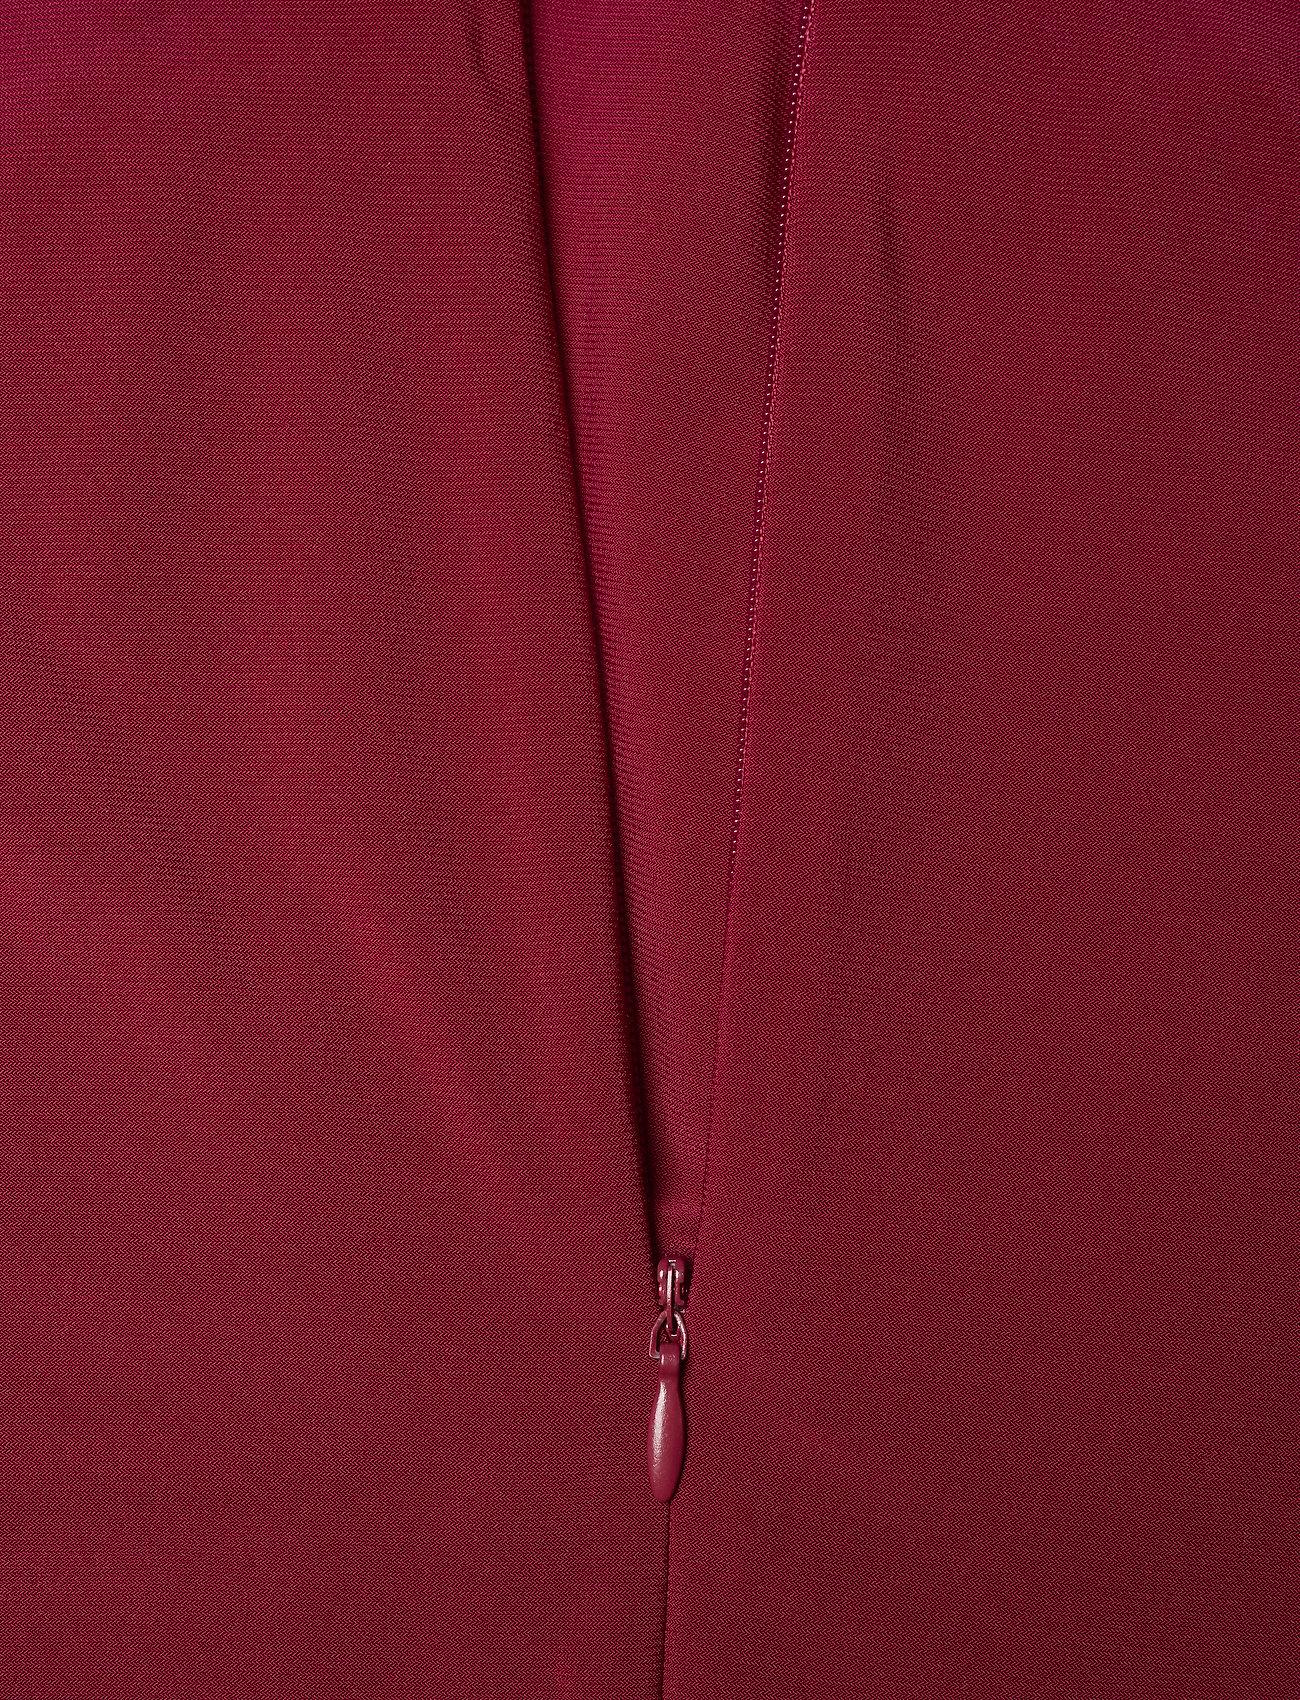 Zanahary-3/4 Sleeve-day Dress (Dark Raspberry) (961.95 kr) - Lauren Women